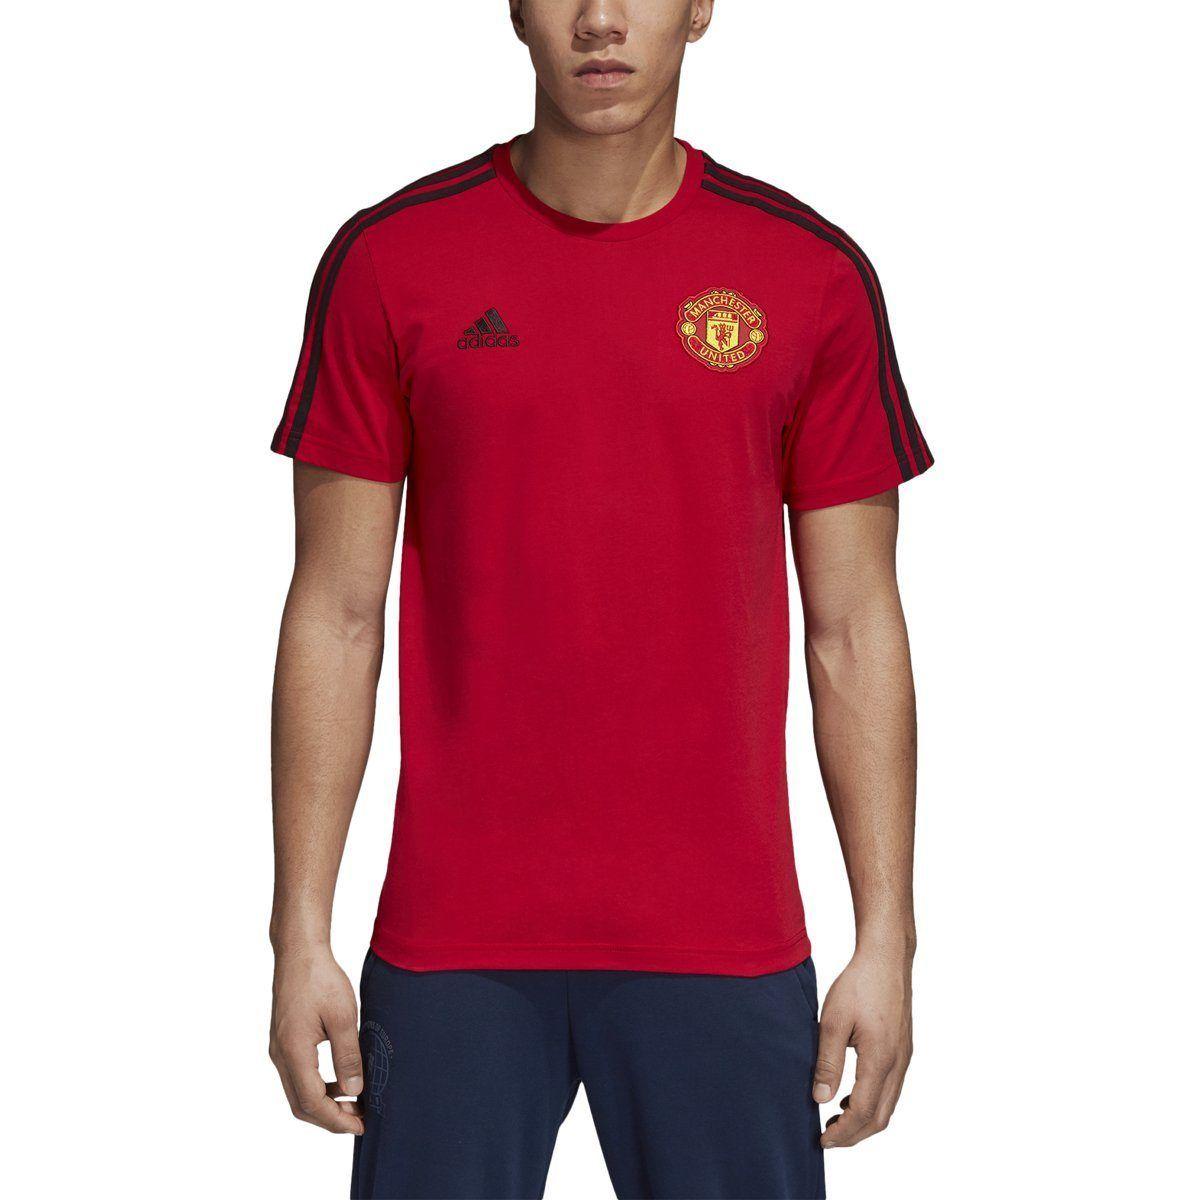 84204385c36 adidas Men s Manchester United 3-Stripes Tee